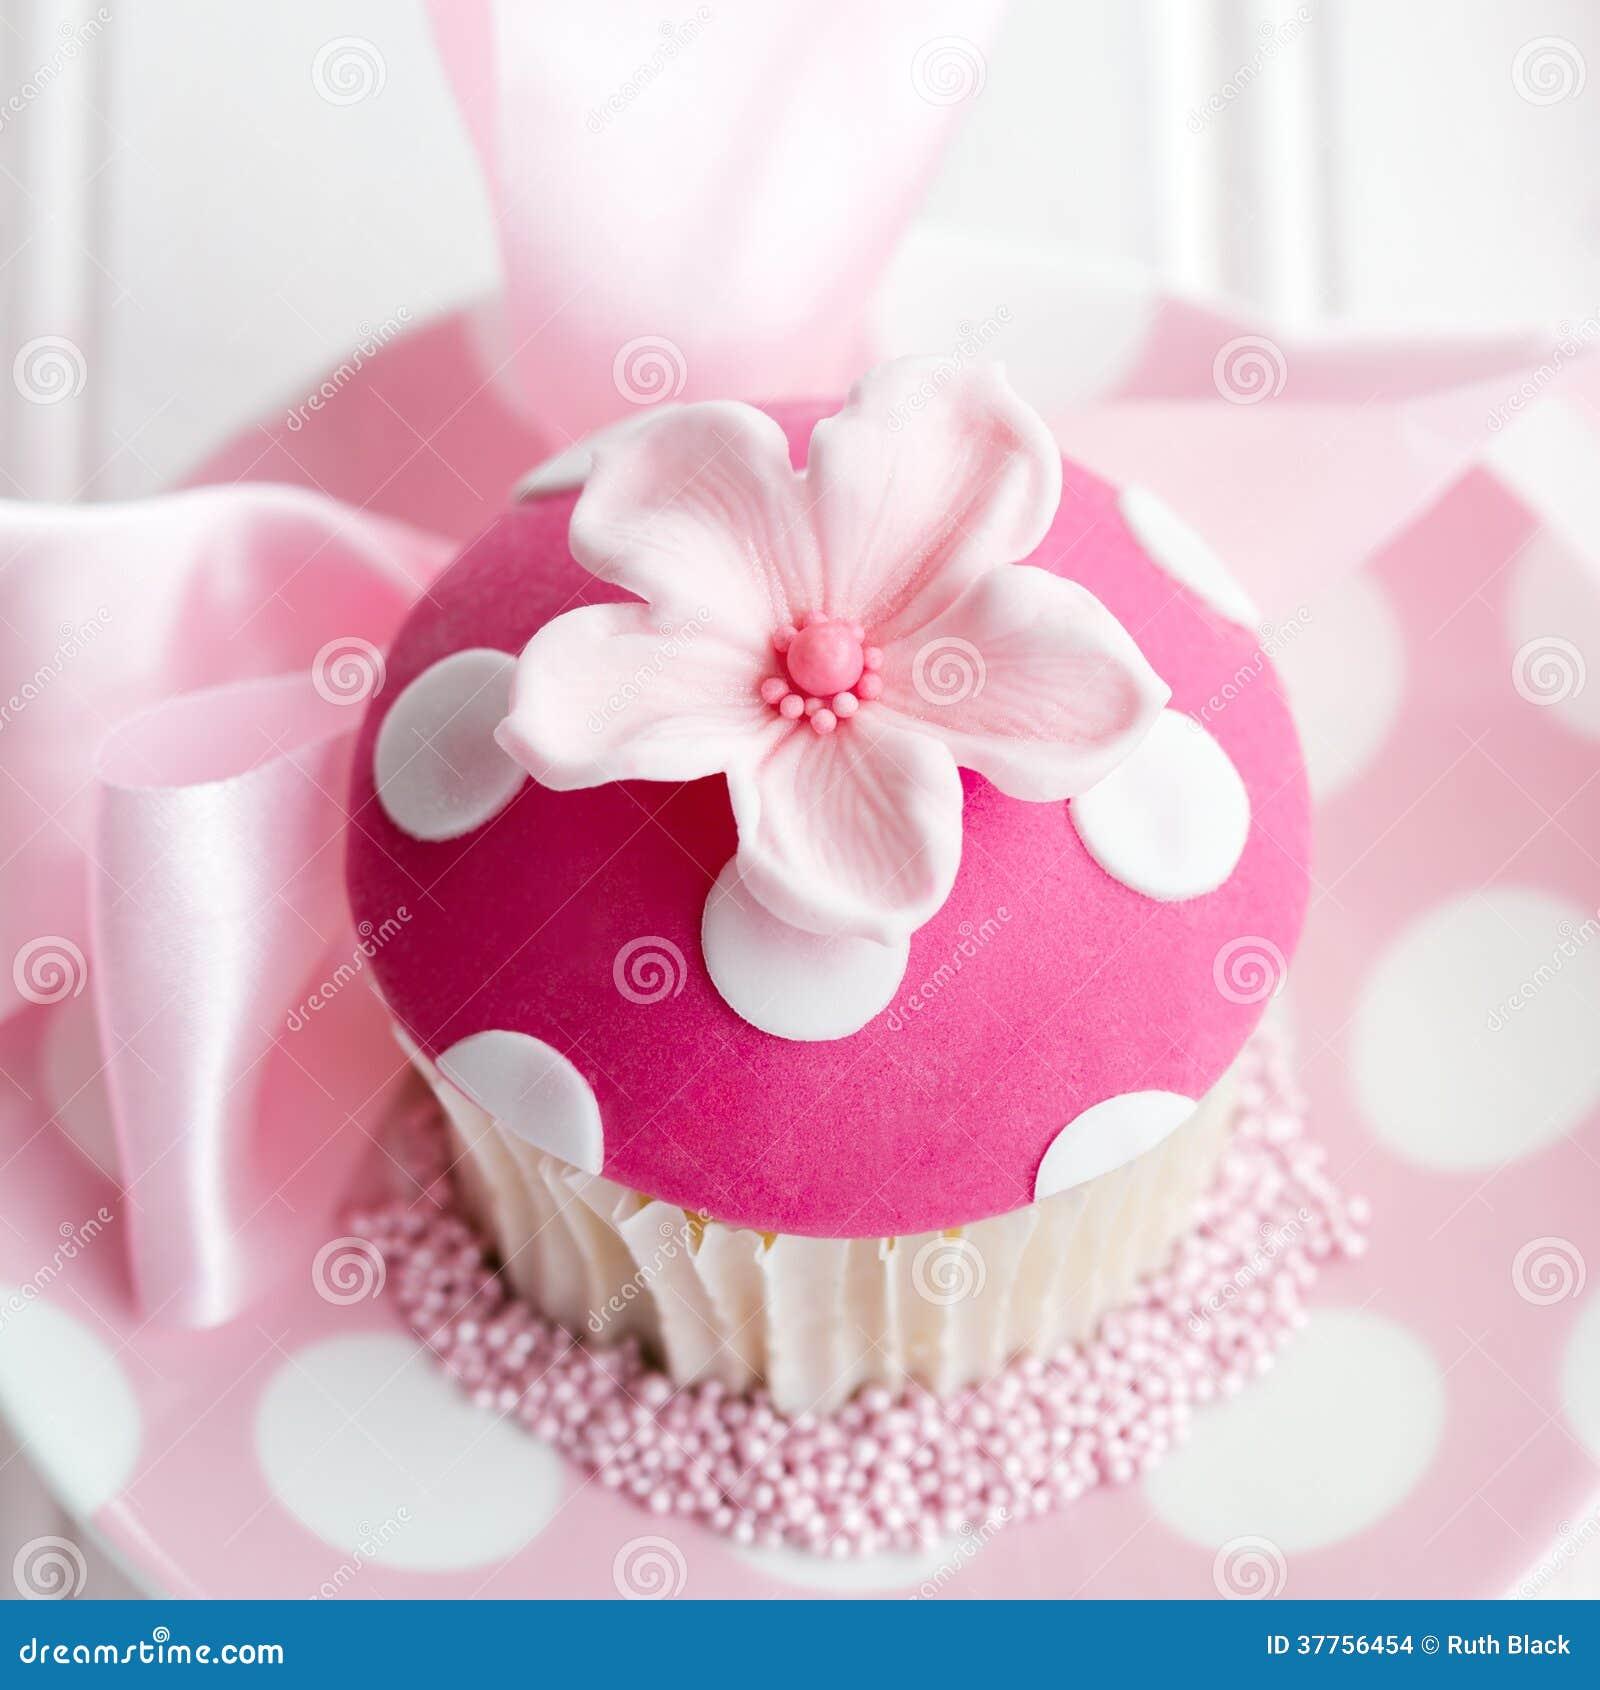 Pink Flower Cupcake Stock Photo Image Of Square Sprinkles 37756454